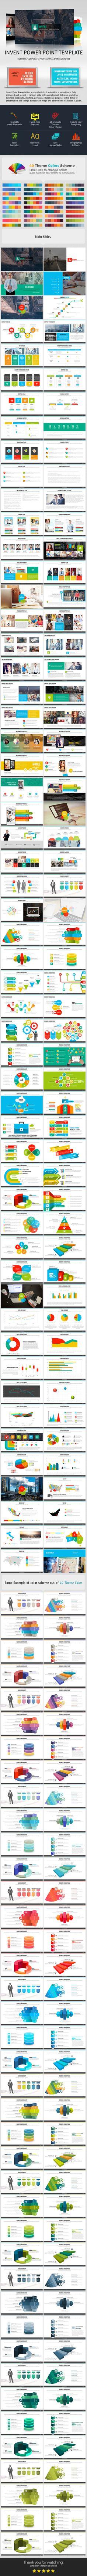 Invent Business Power Point Presentation Design Tempalte #slides Download: http://graphicriver.net/item/invent-business-power-point-presentation/12933263?ref=ksioks